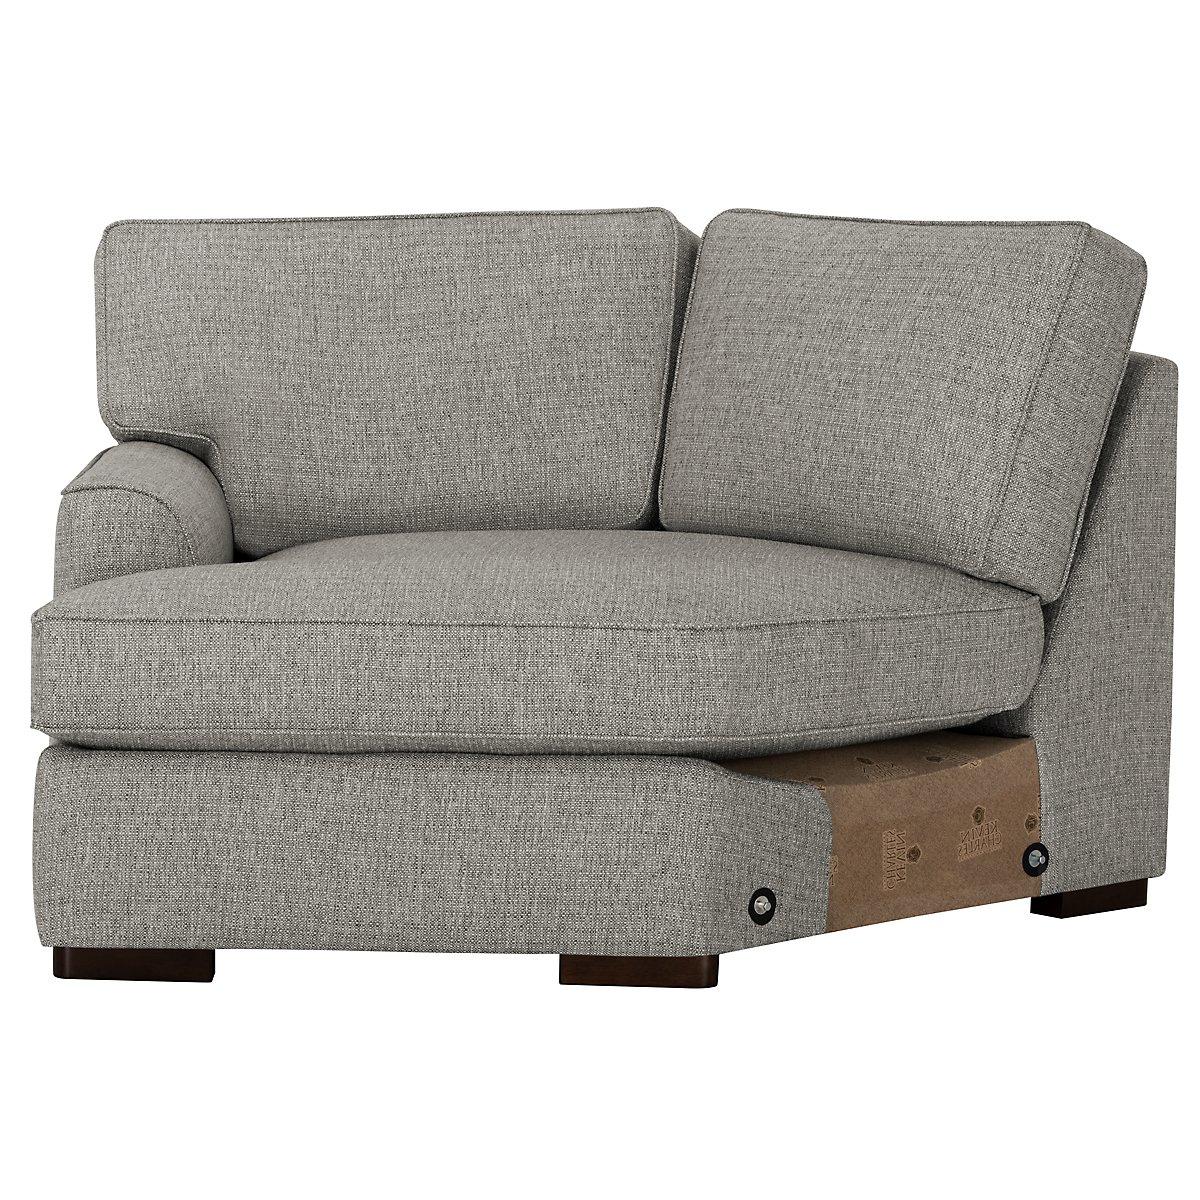 City Furniture: Austin Gray Fabric Dual Cuddler Sectional